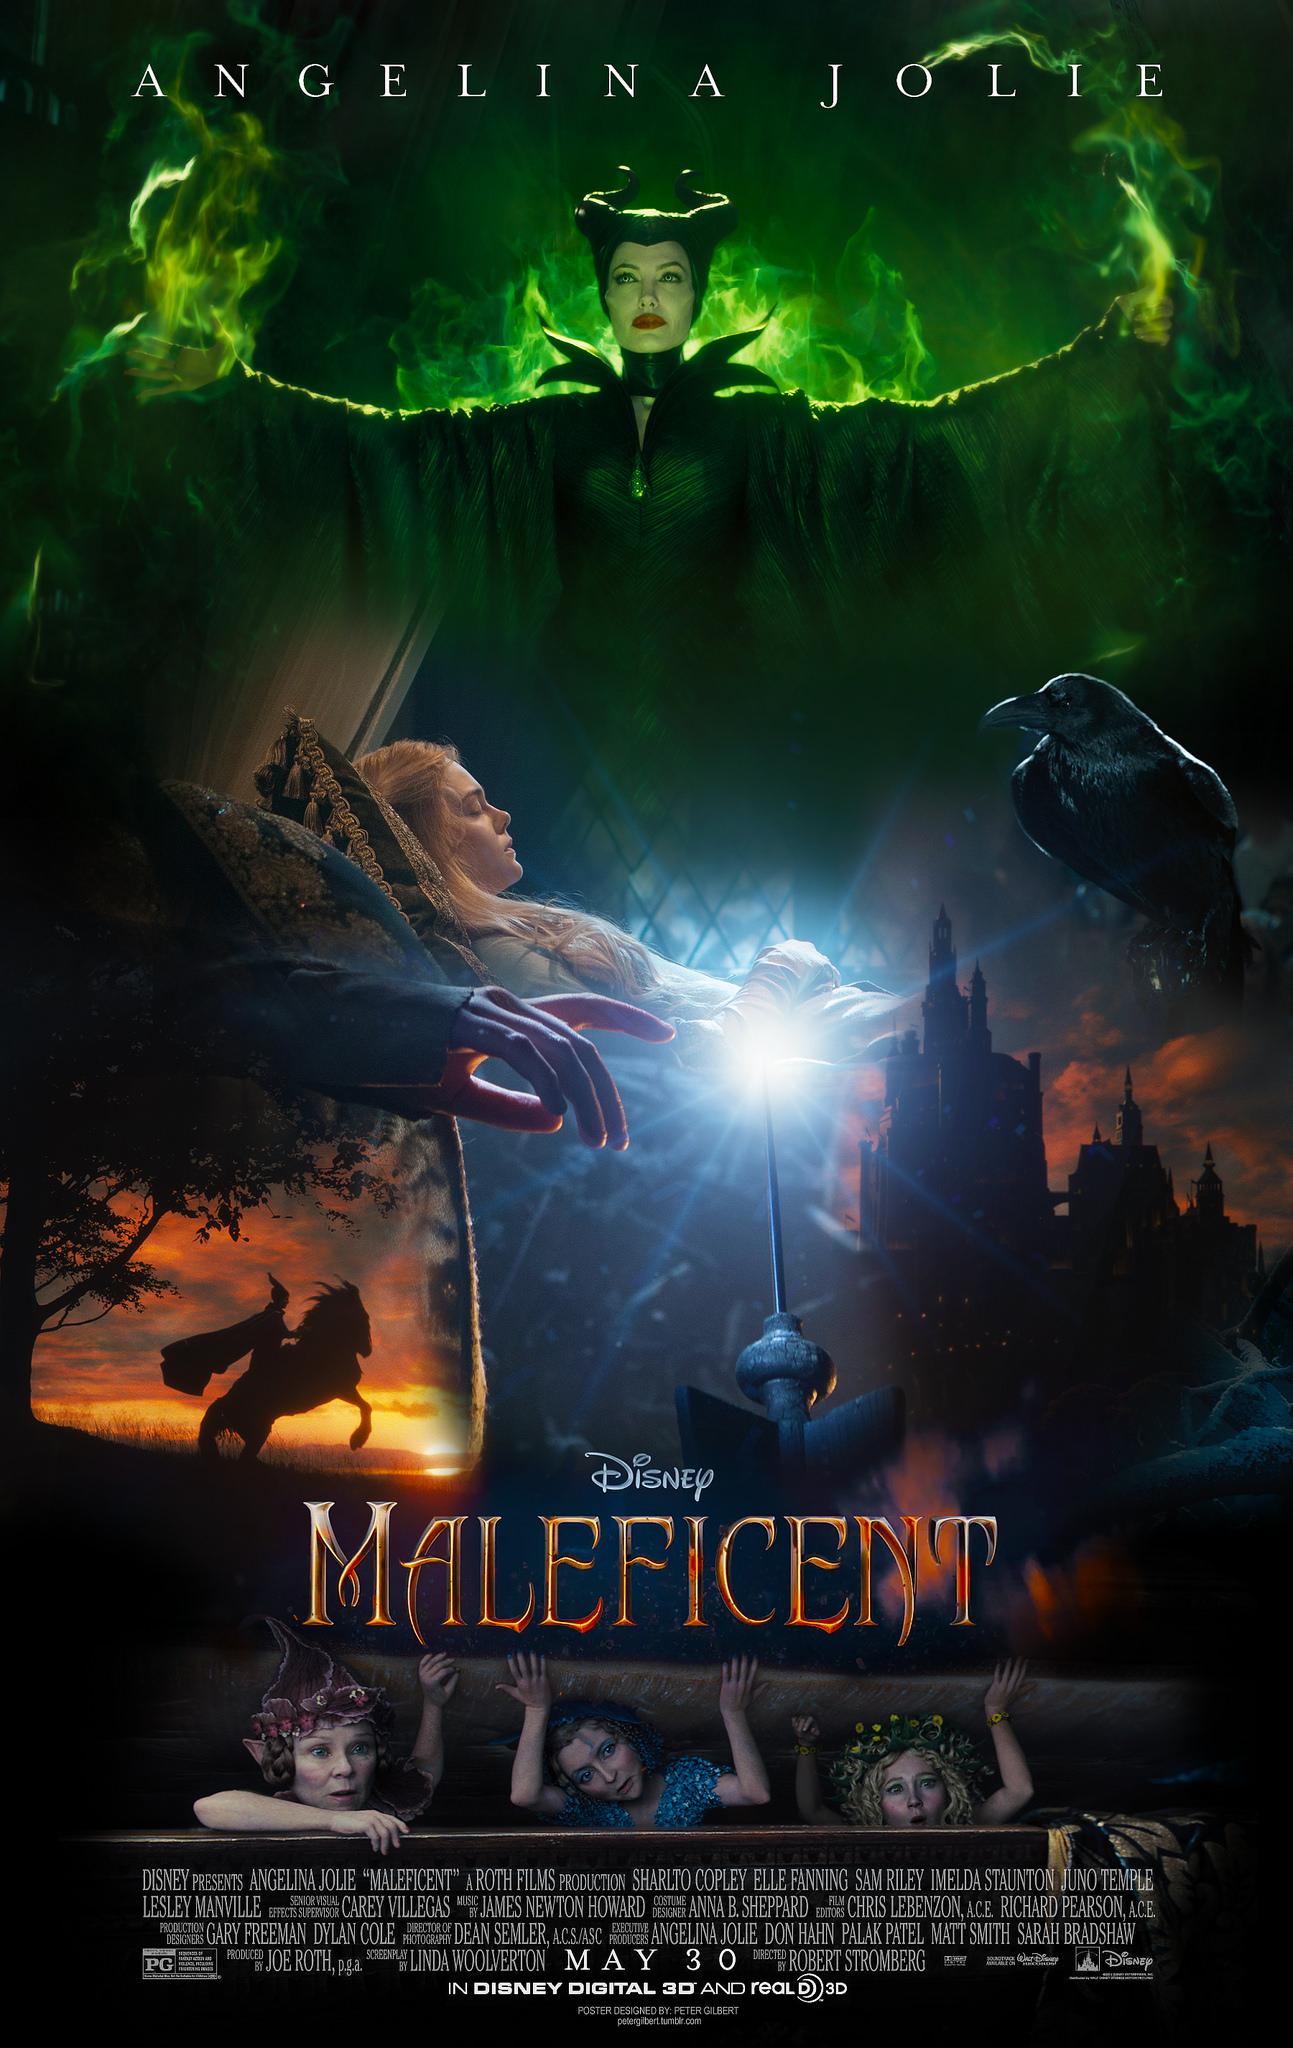 Movie Maleficent 2014 Poster